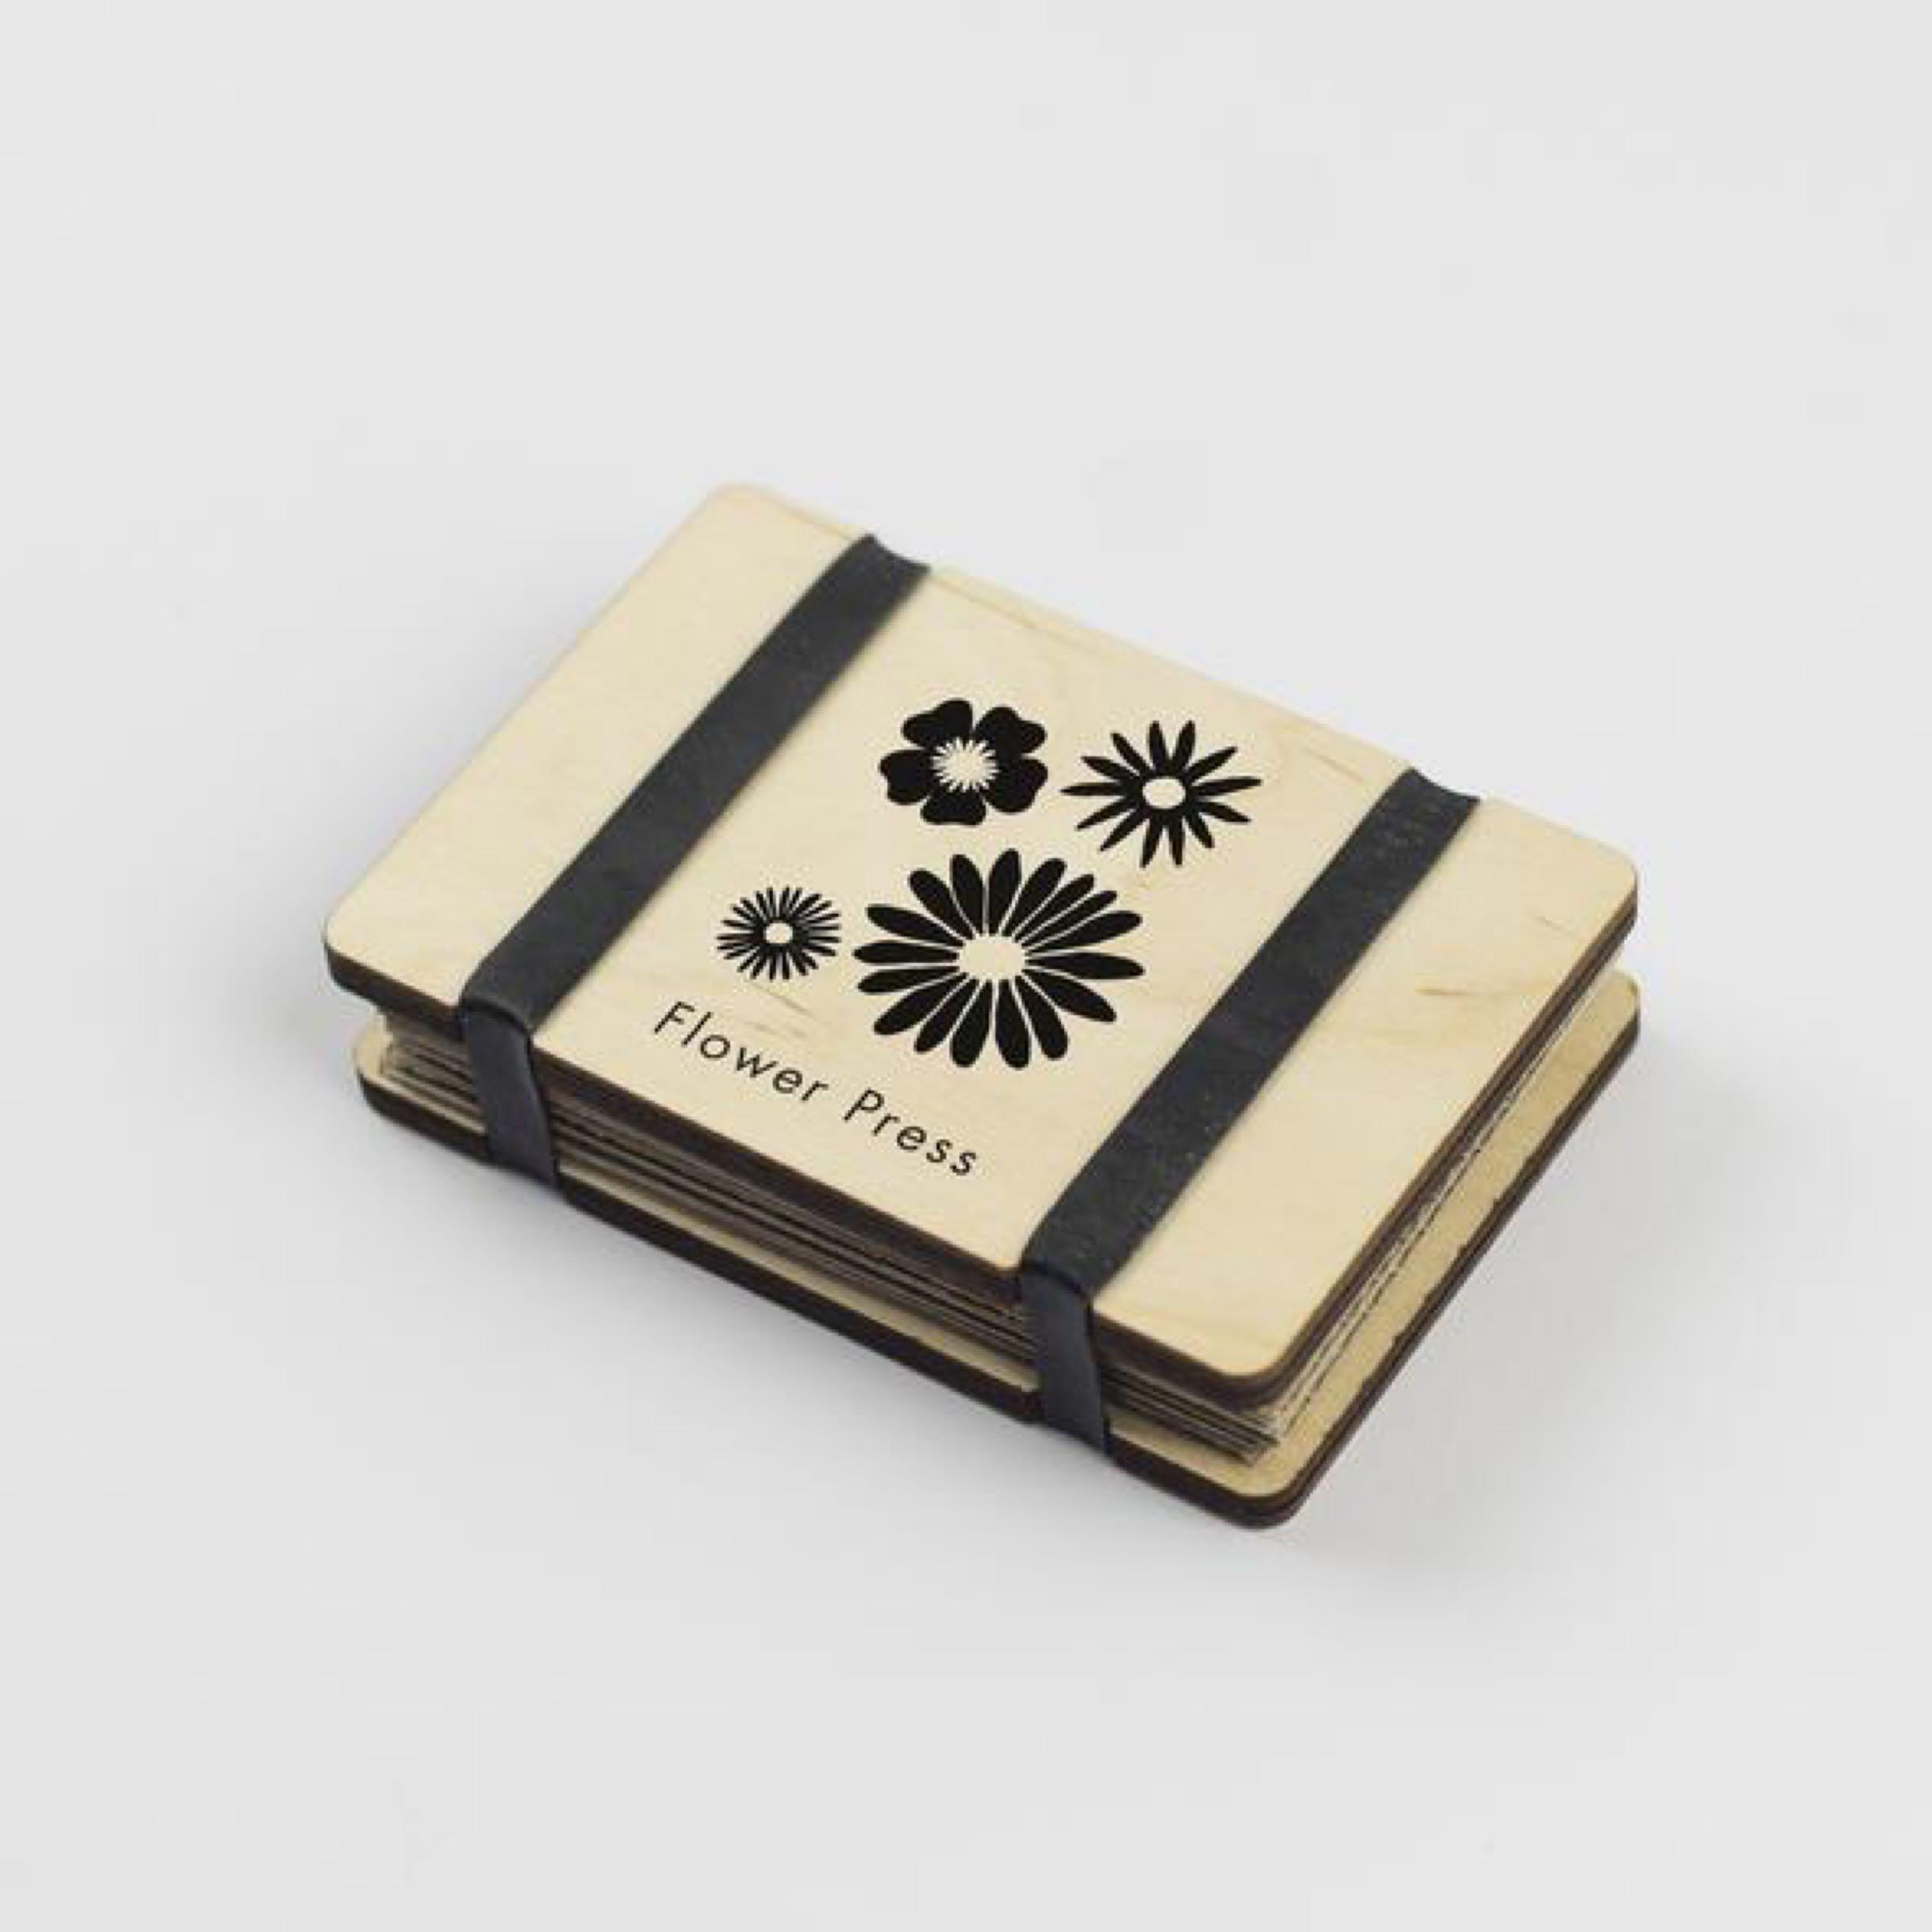 Pocket Flower Press - Silhouette by Studio Wald